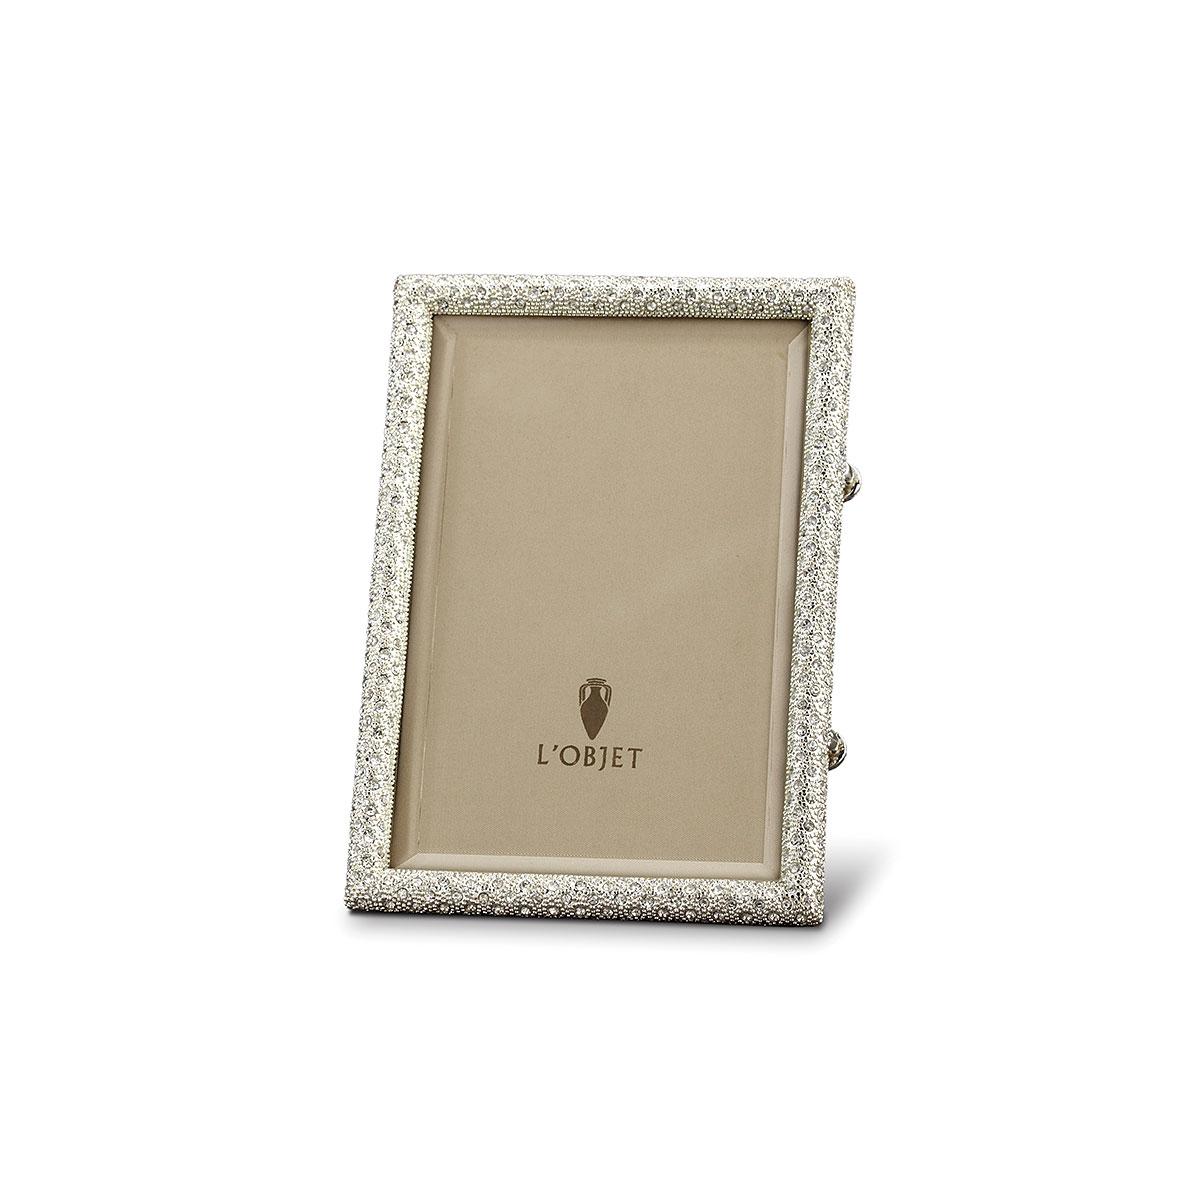 L'Objet I Rectangular Pave Frame Small Platinum White Crystals